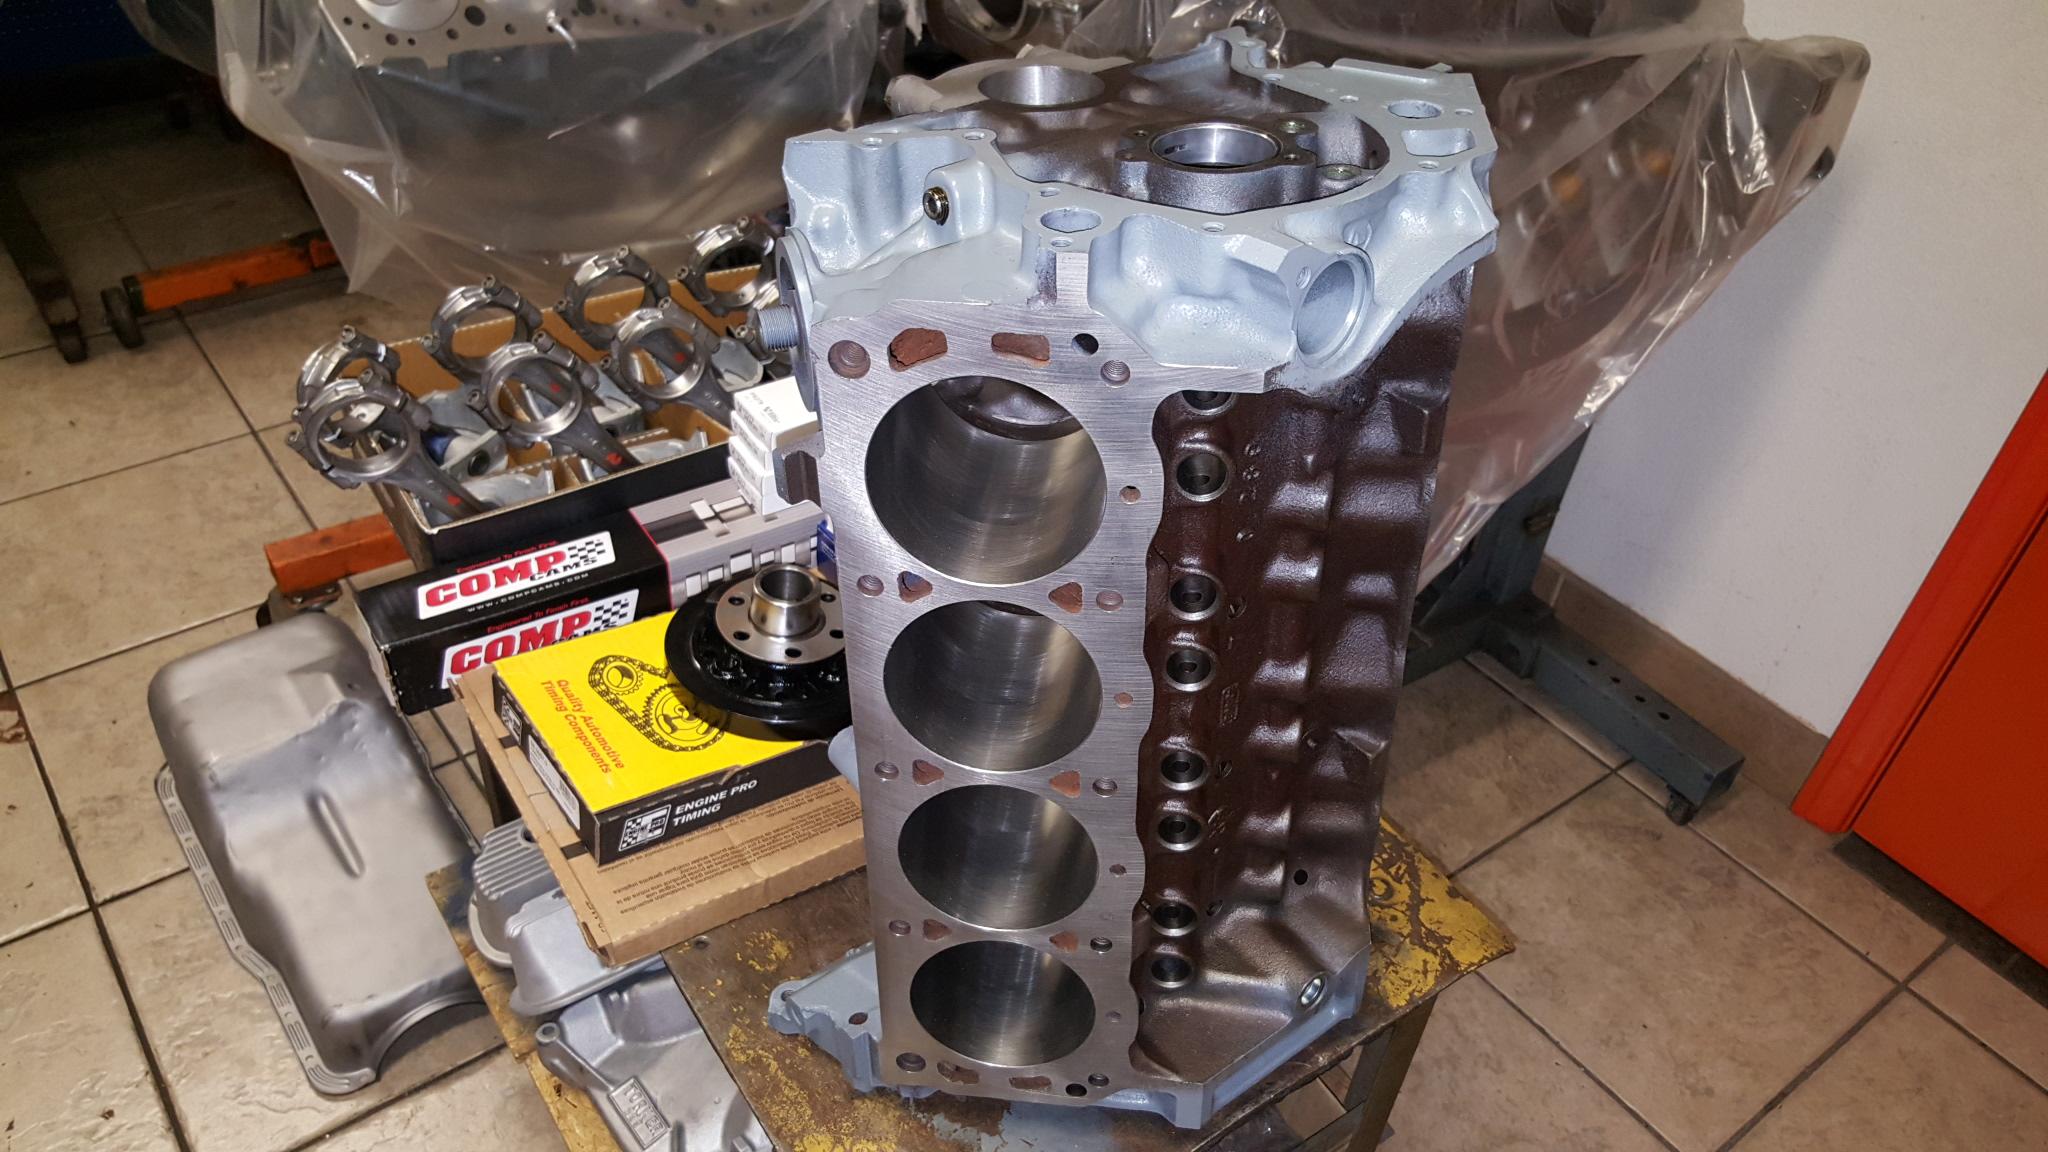 Ford Mustang 289 V8 Engine Machine Work For Rebuild - Motor